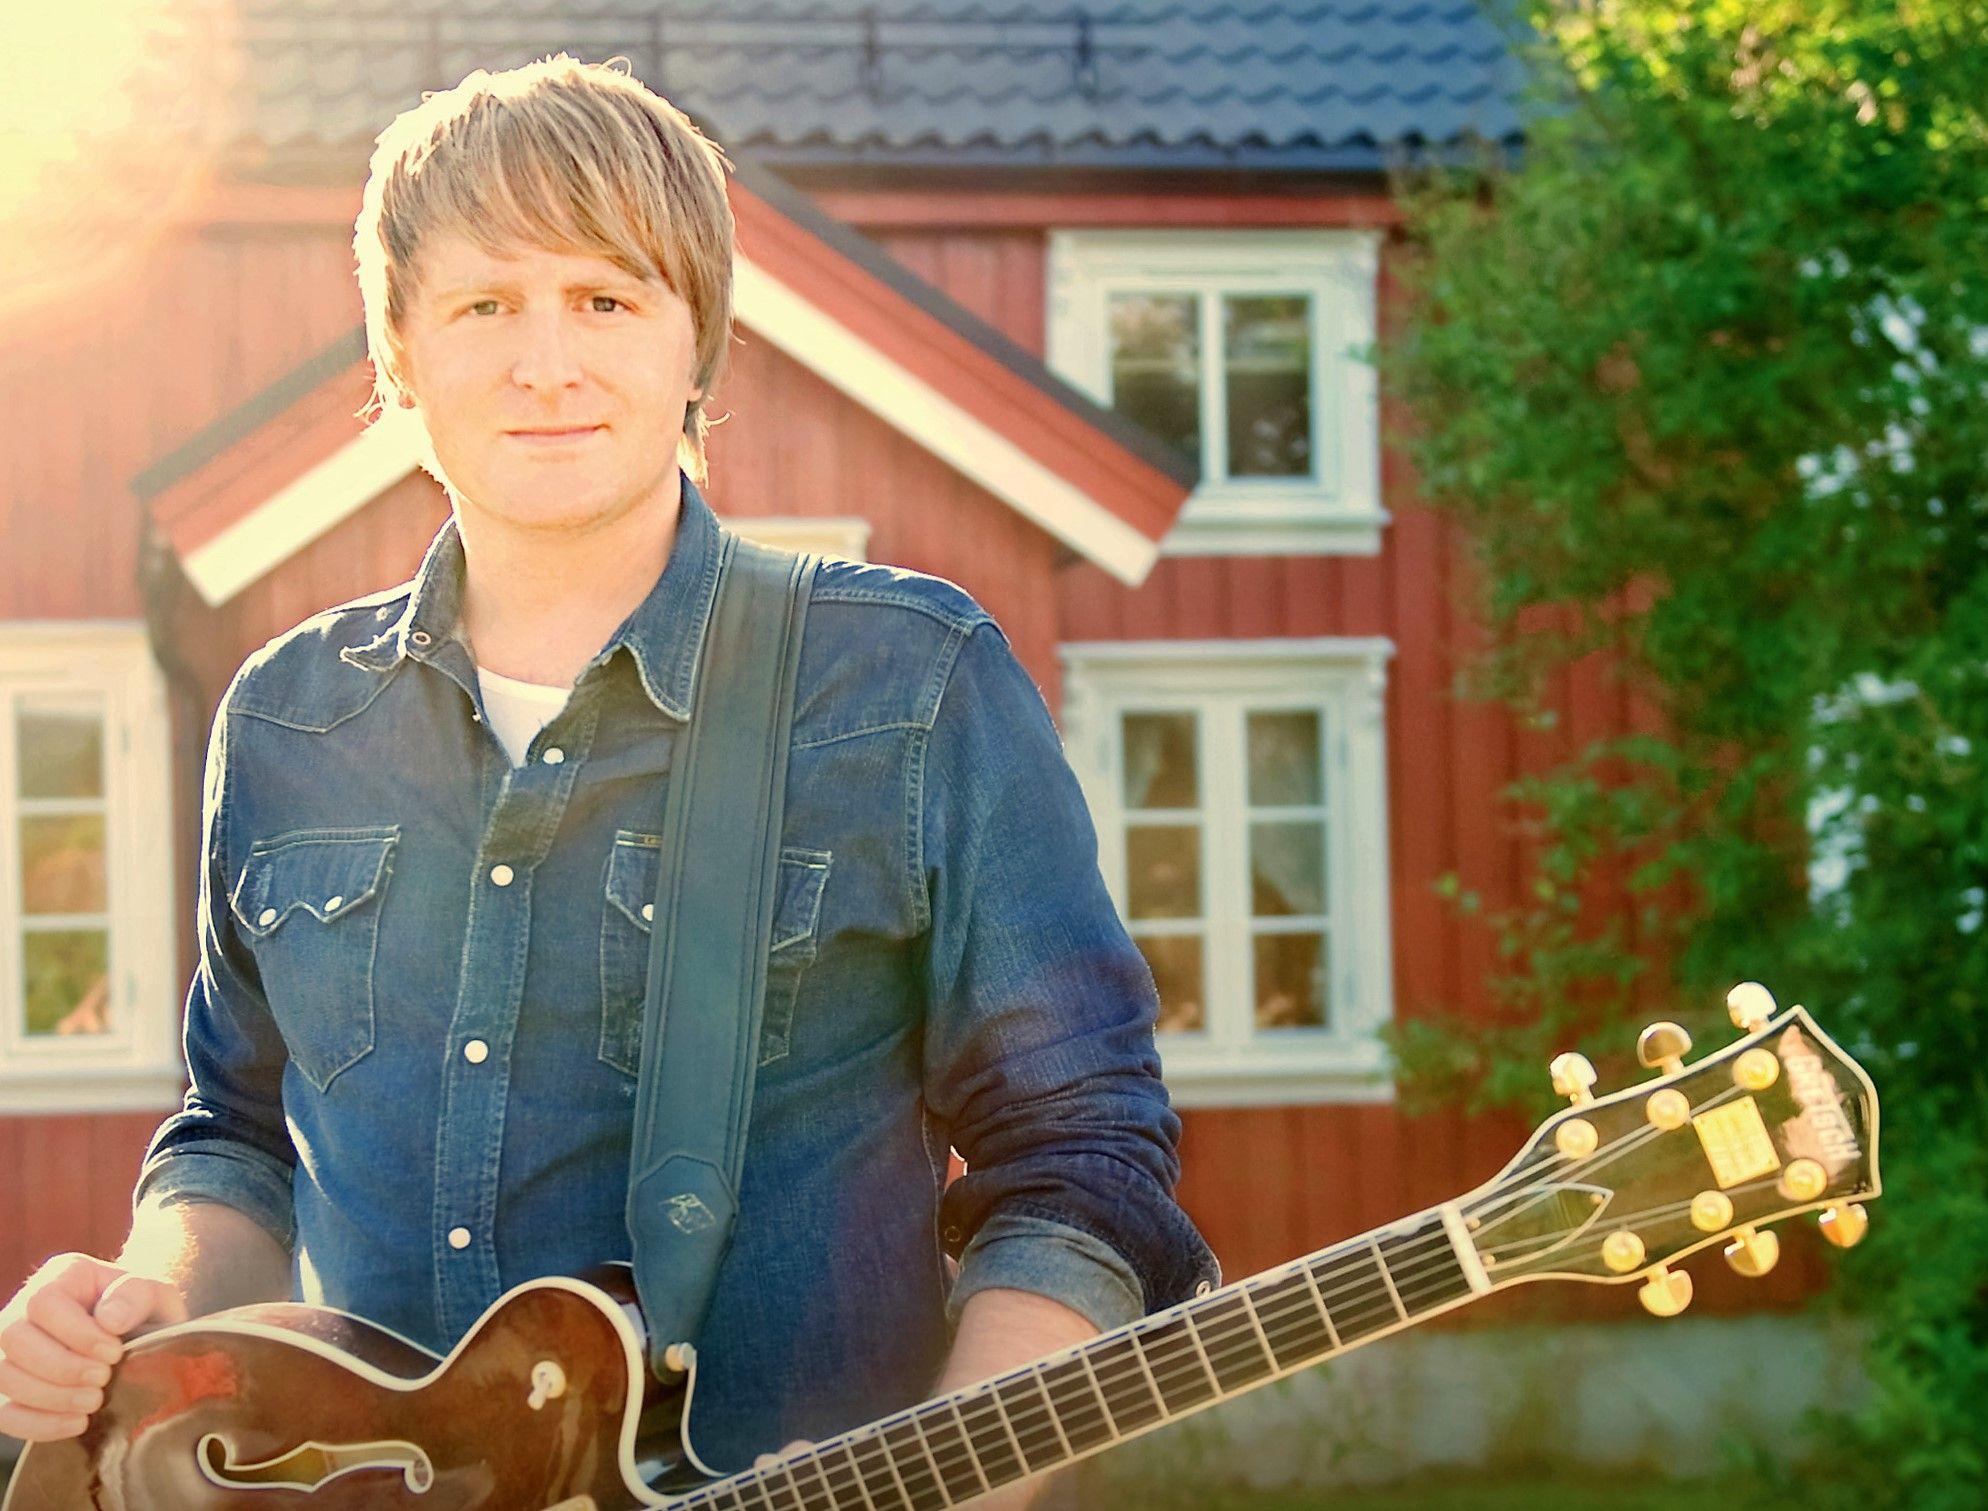 KOR ARTI'-SANGEN: Askil Holm har komponert sangen Kor Arti', som inngår i høstens Kor Arti'-repertoar.